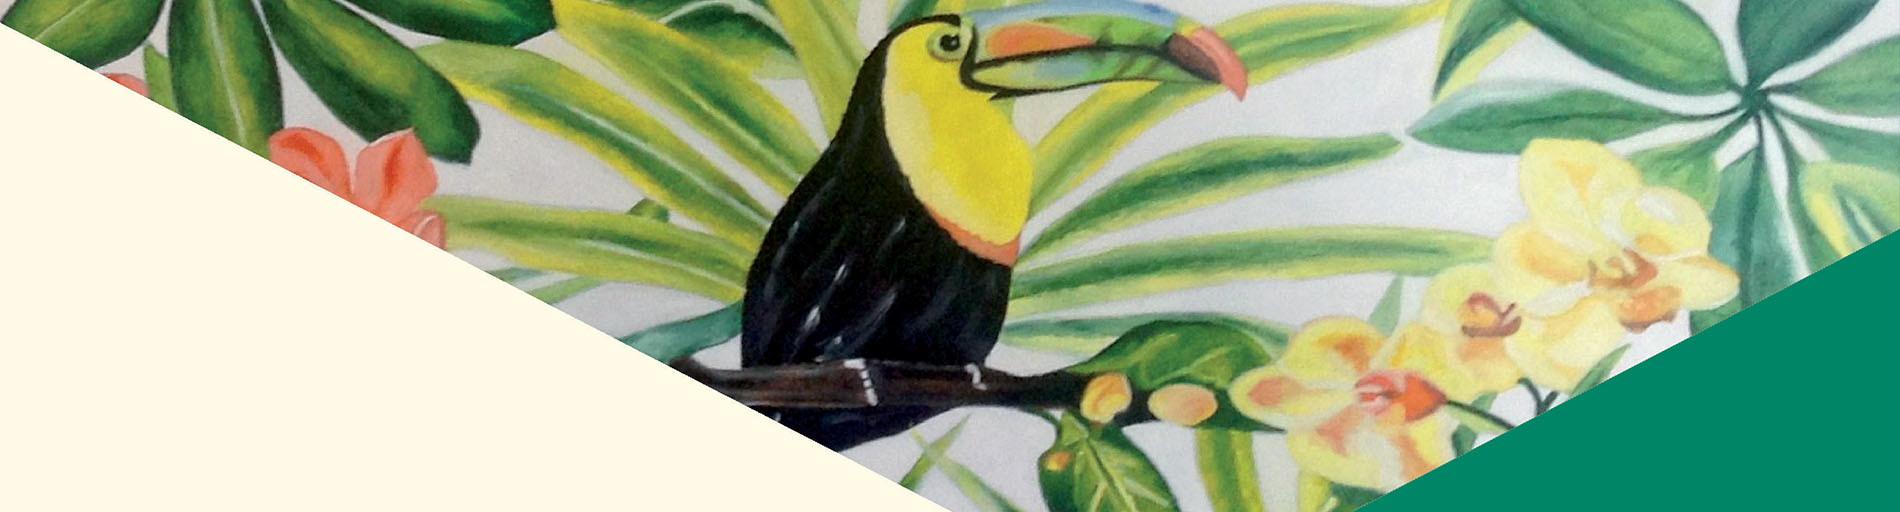 EXPOSITION PEINTURE – PIERRE DERVILLEZ